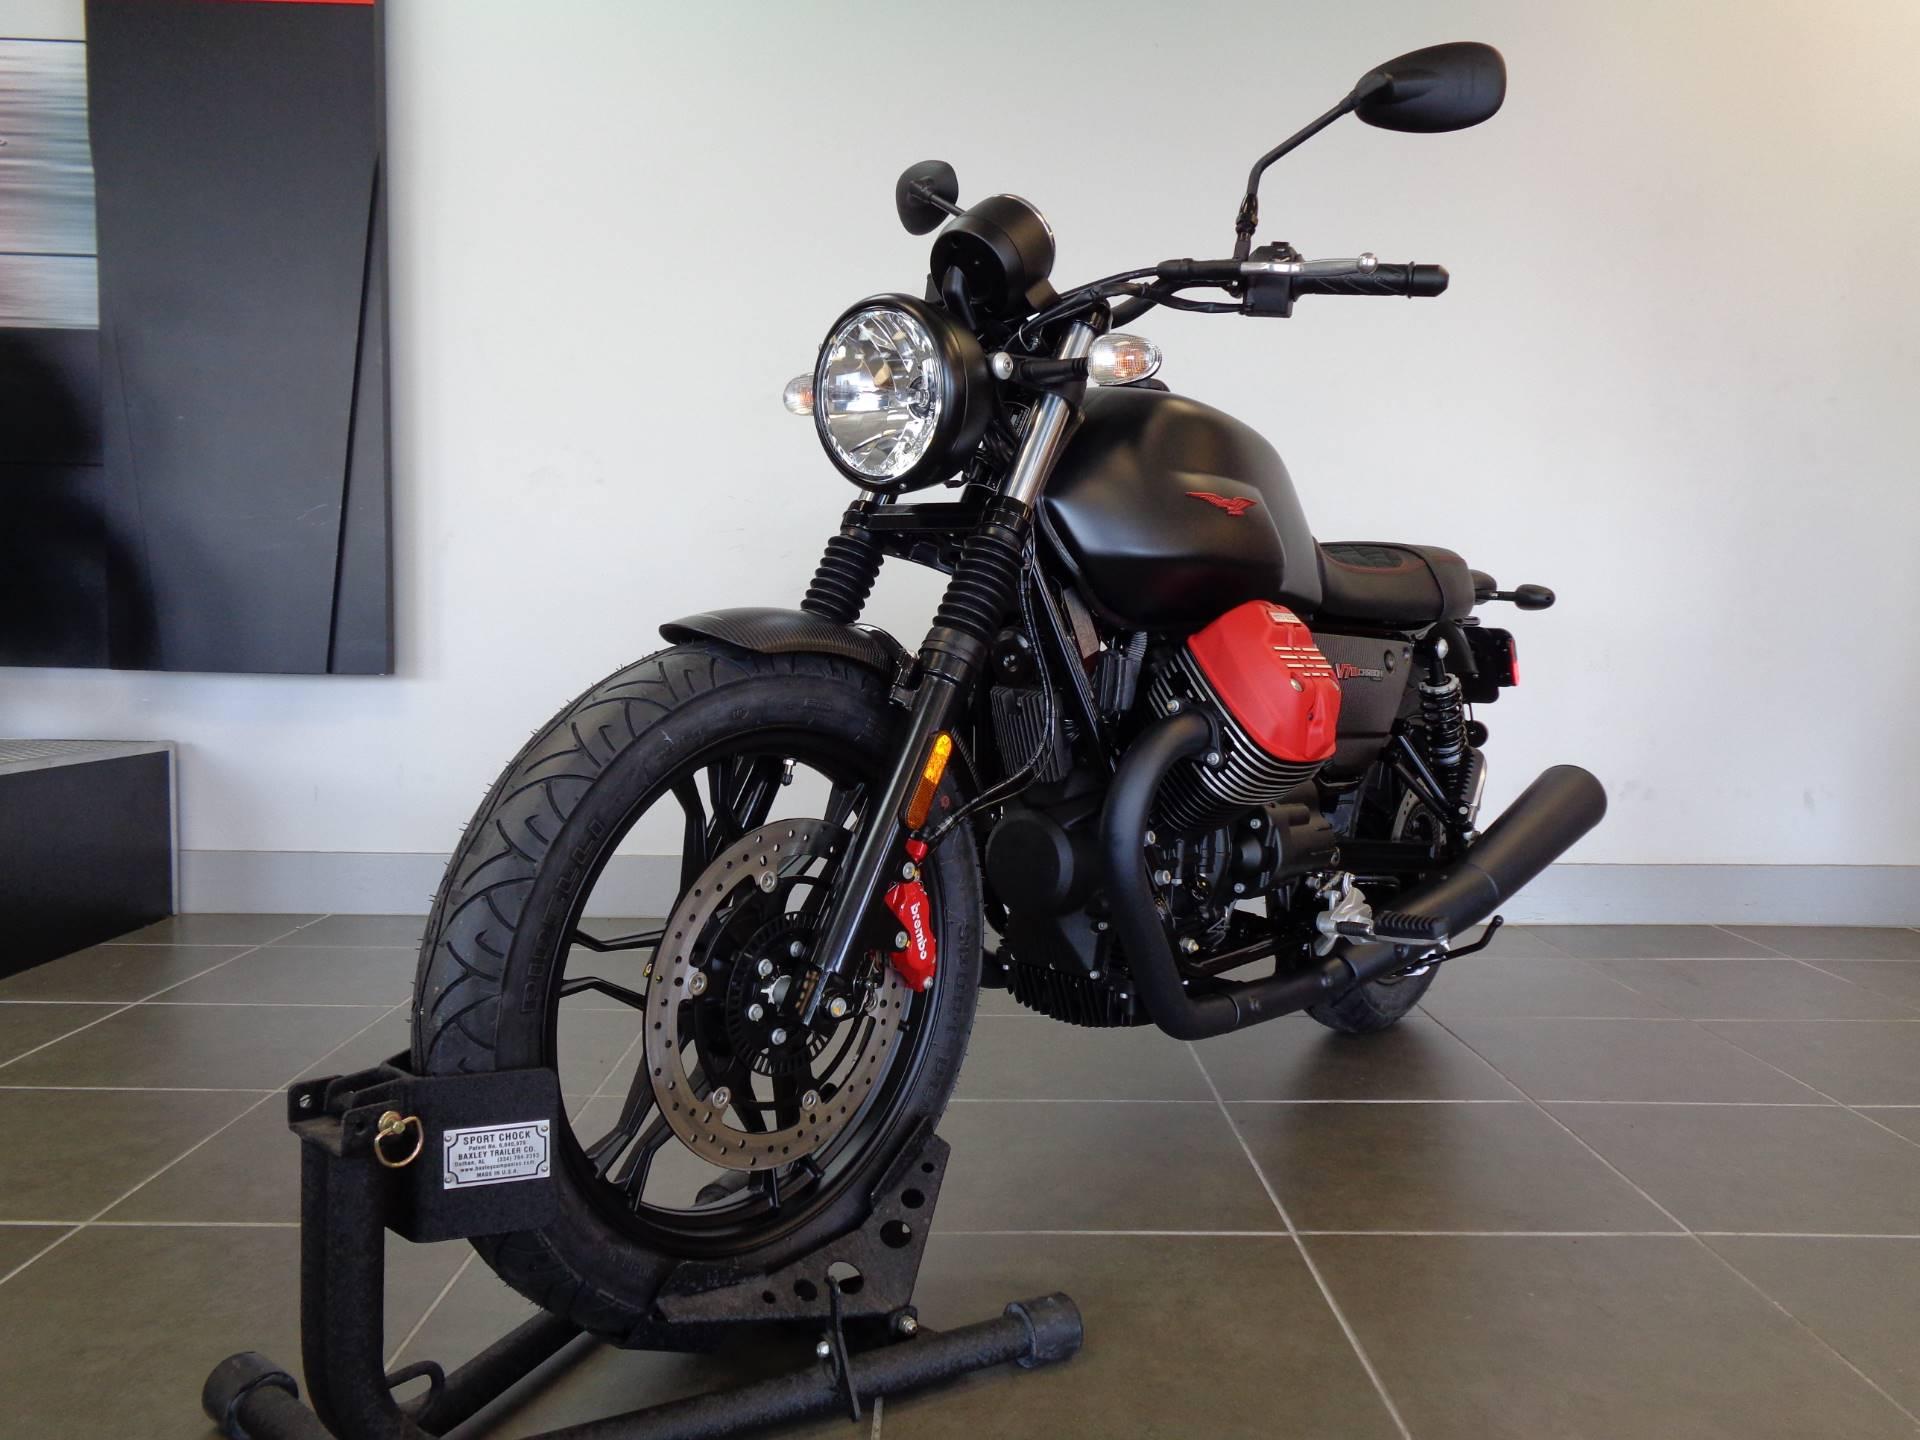 2018 Moto Guzzi V7 III Carbon Dark 9